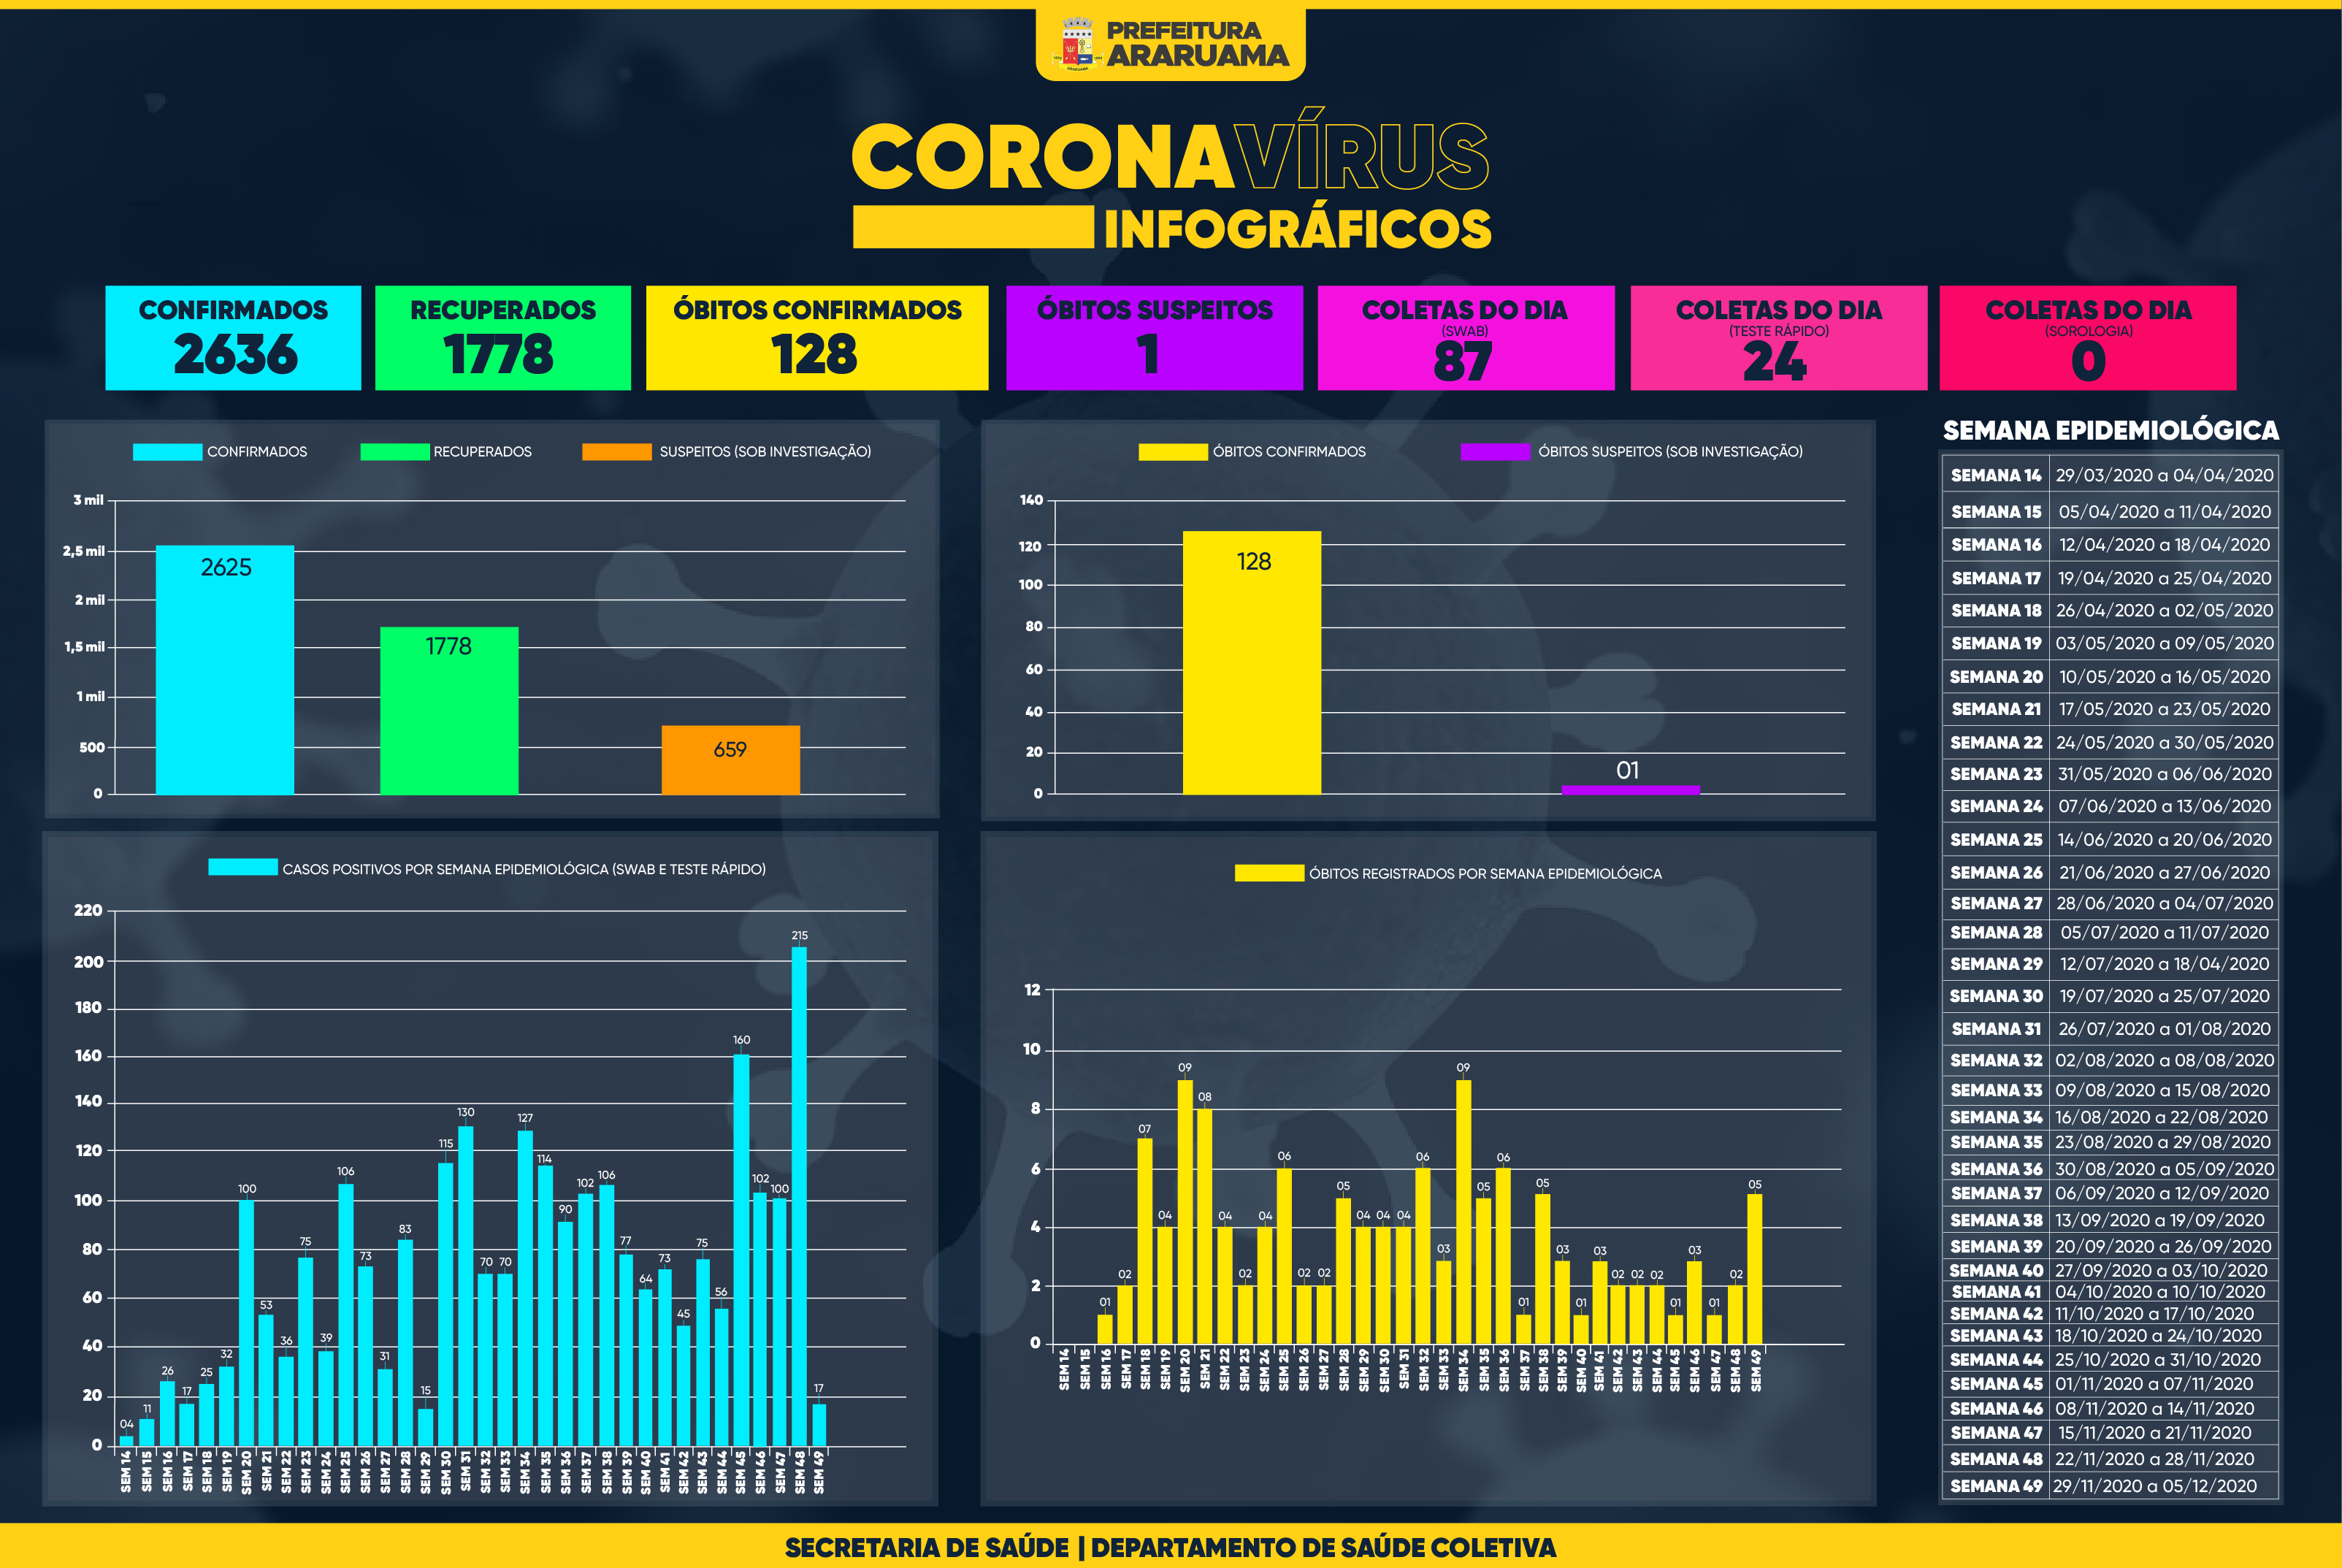 Painel de Monitoramento COVID-19 — Semana 49 — 04 de dezembro de 2020